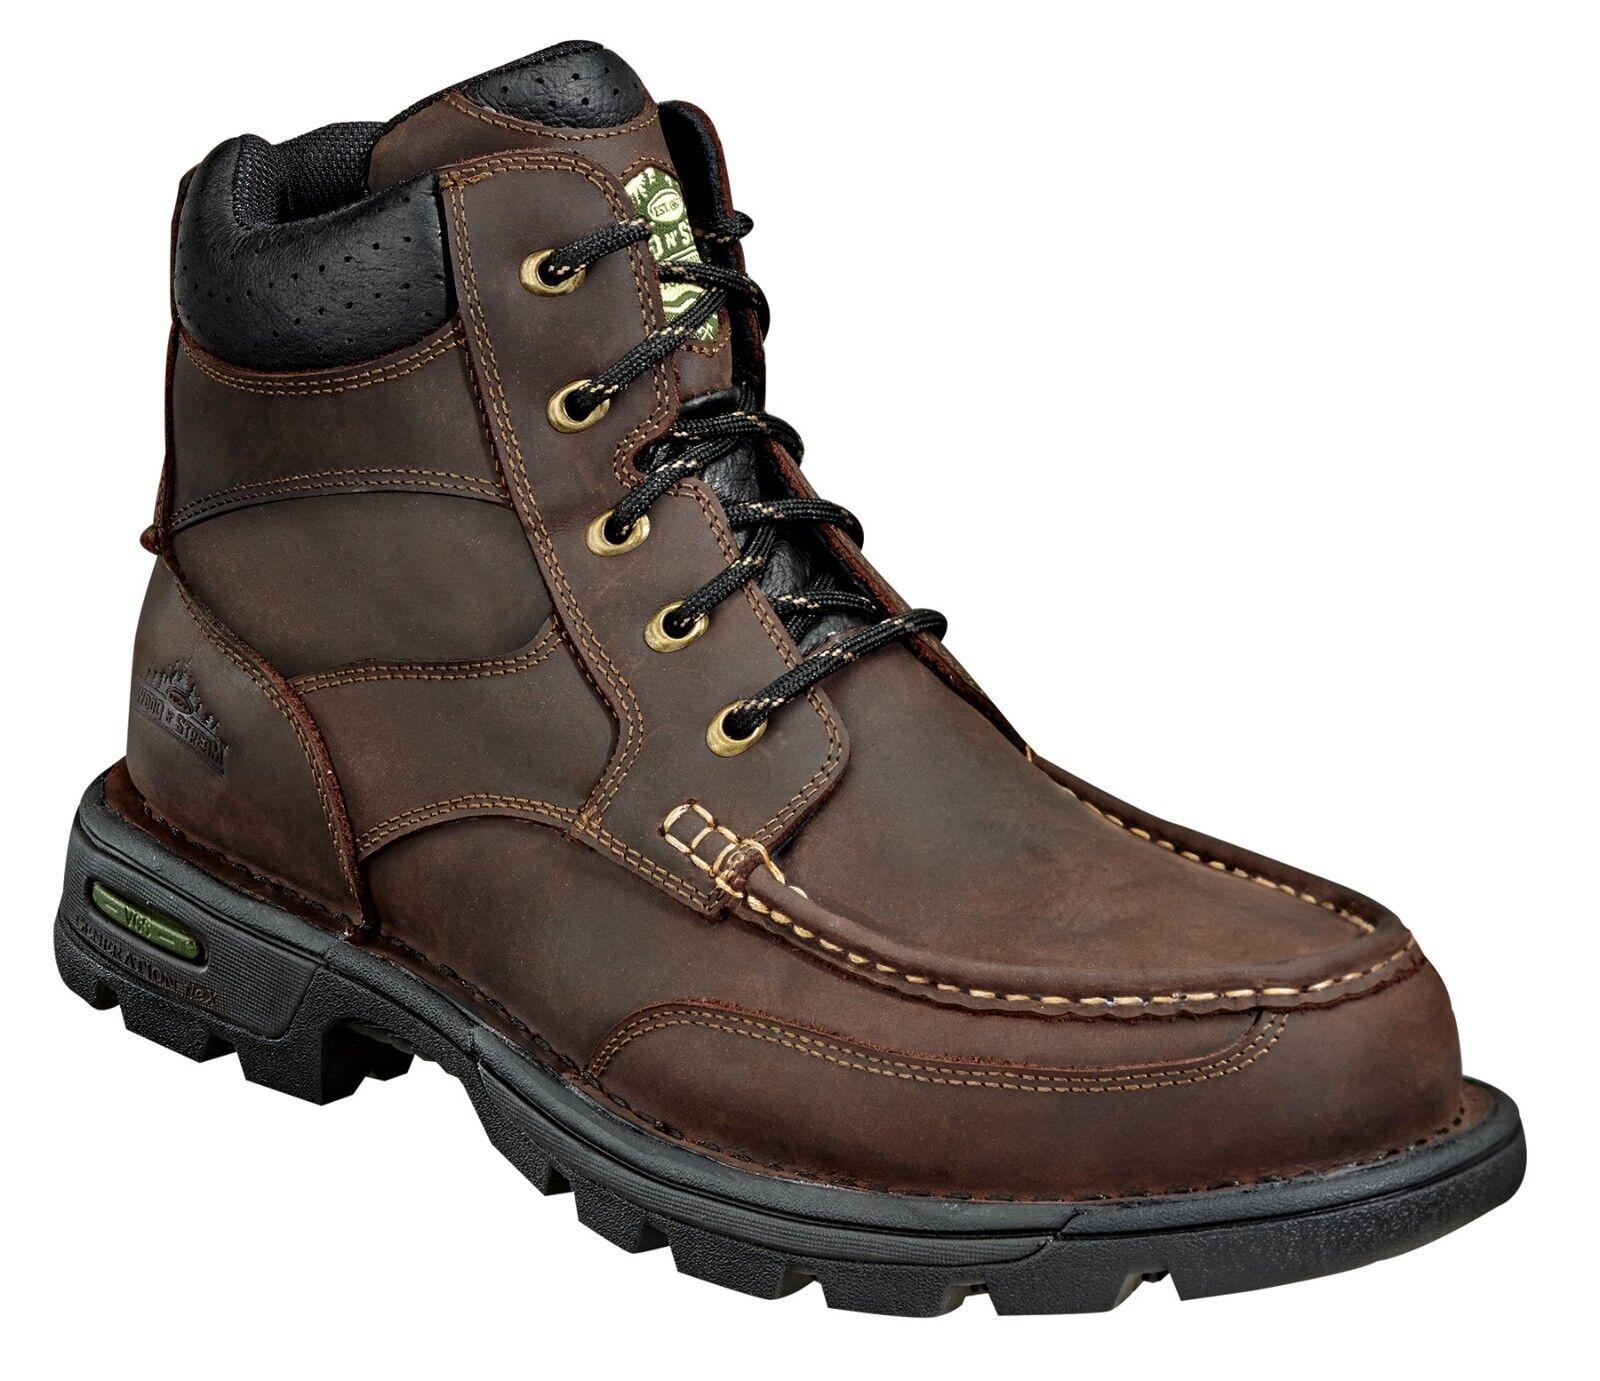 9 M Wood N Stream Thgoldgood Waterproof 6  Moc Toe Pioneer Chukka Crazyhorse 6011